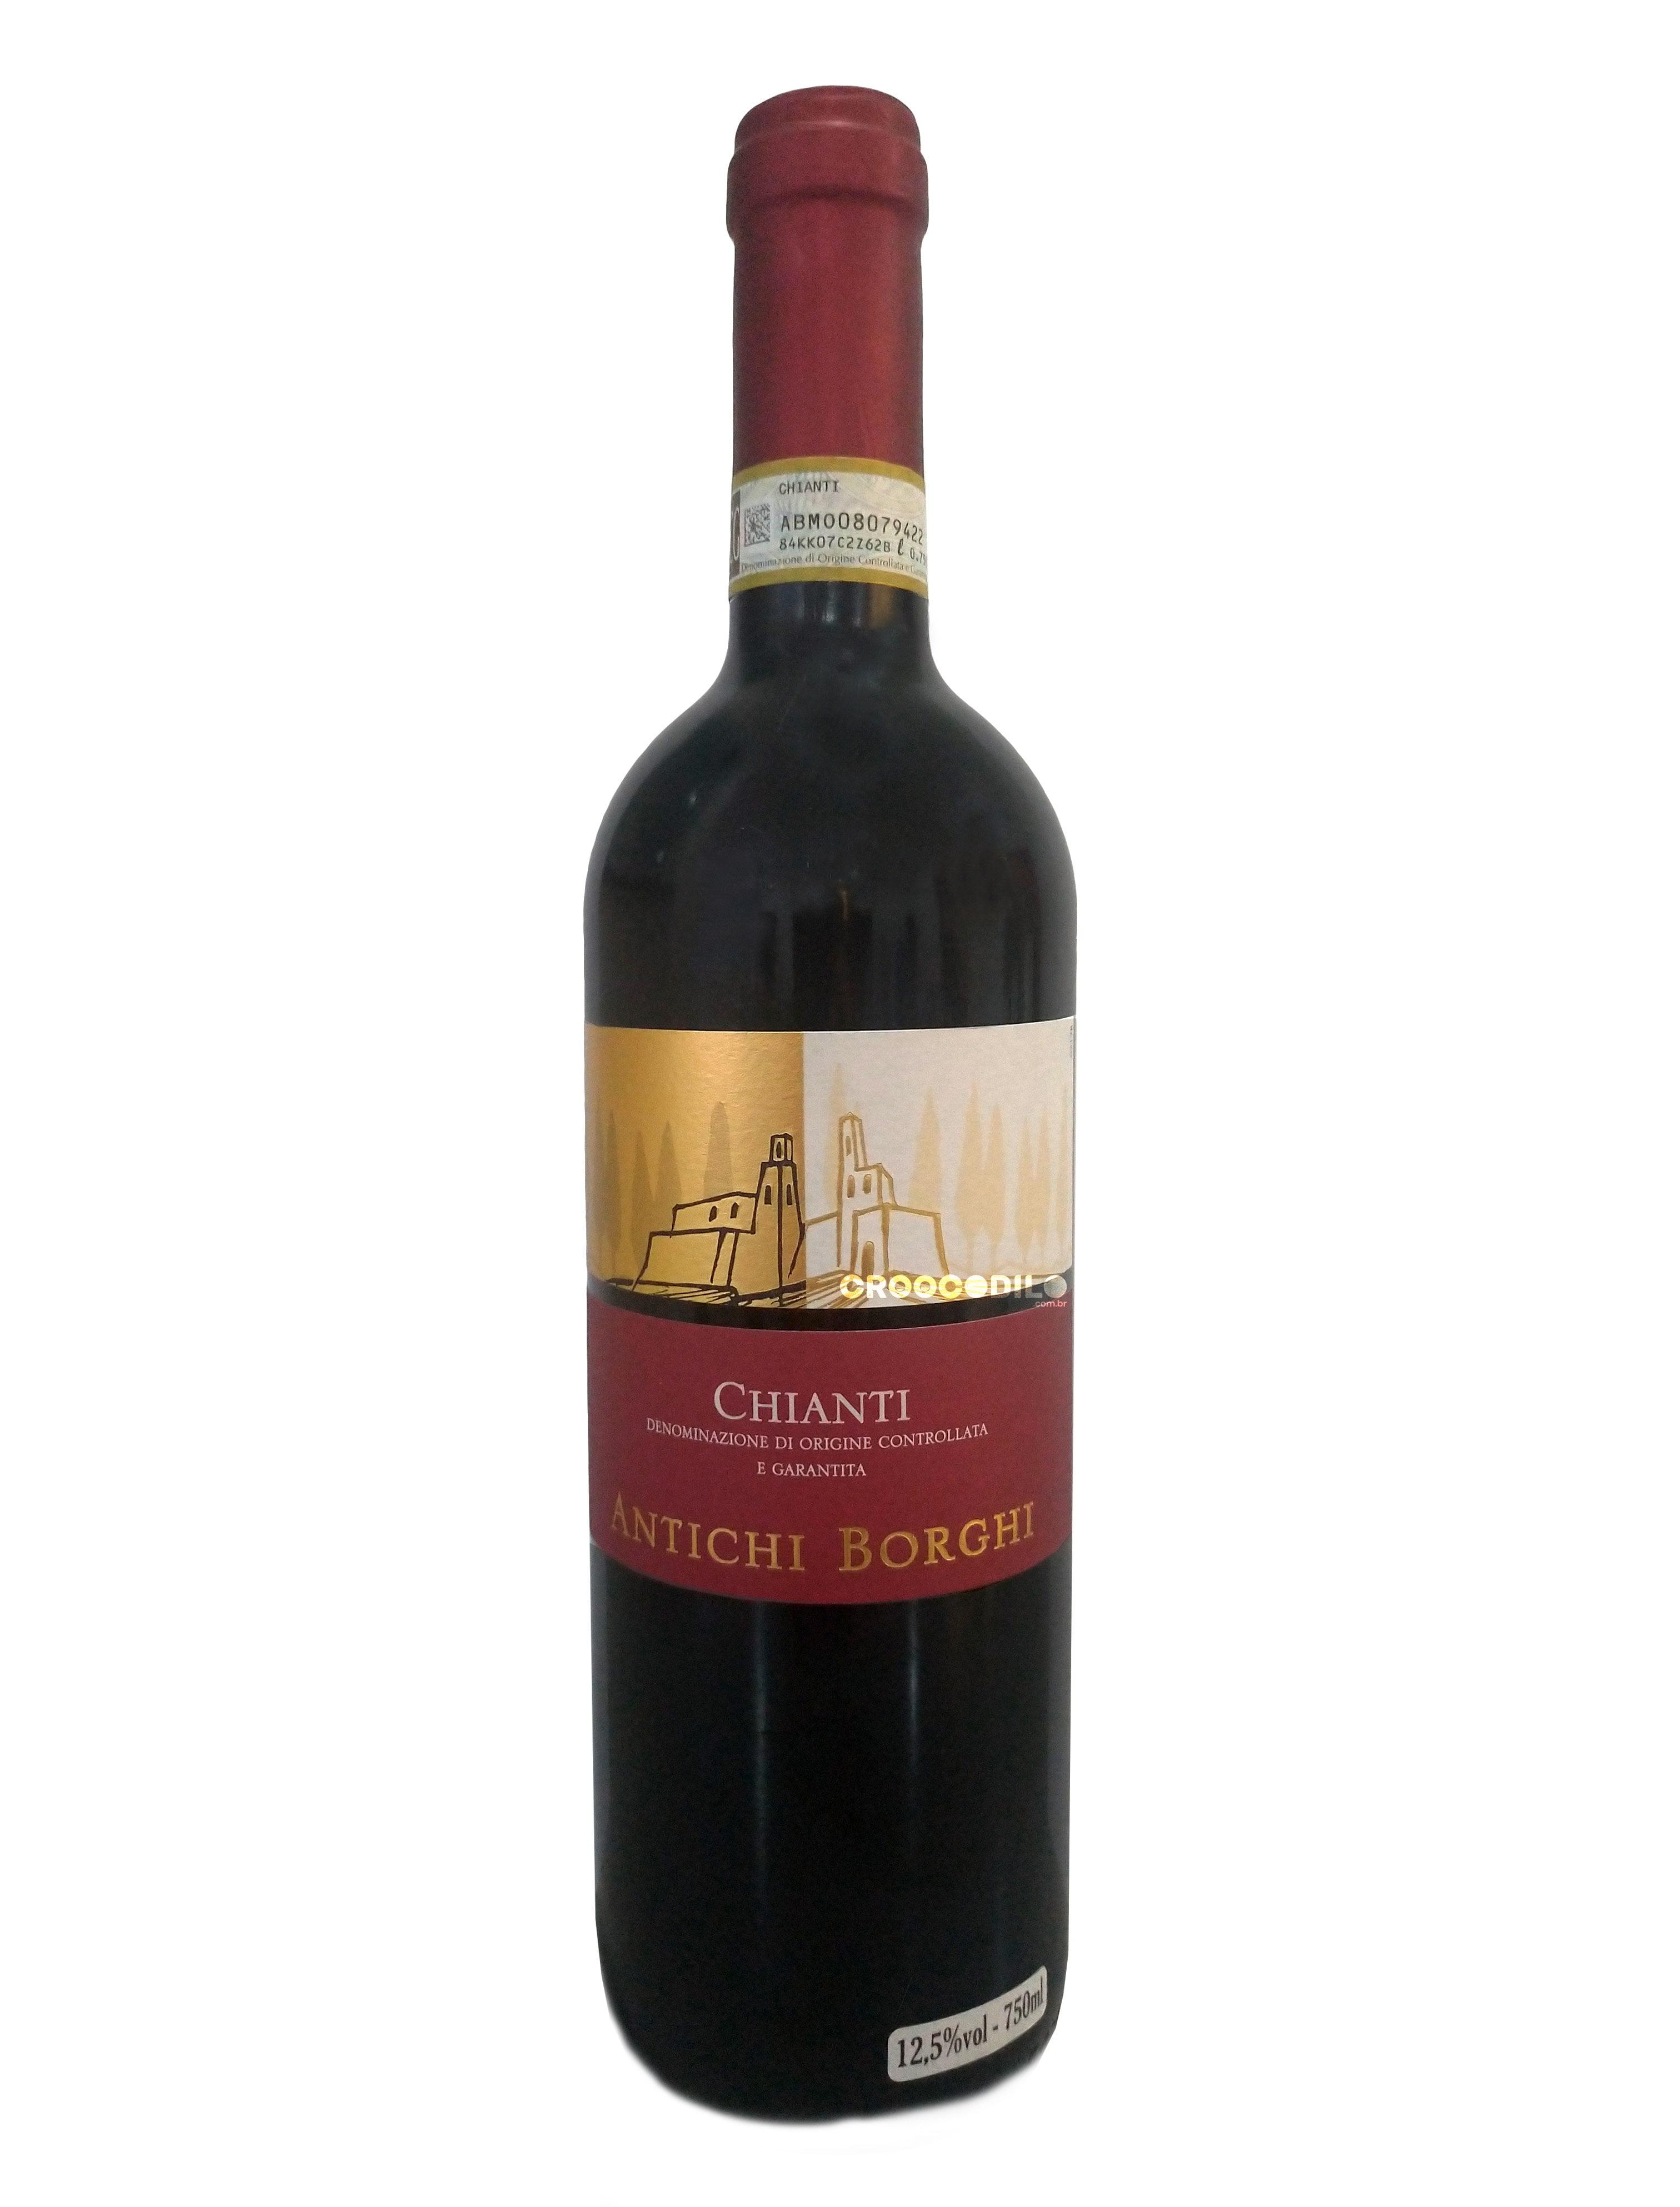 Vinho Antichi Borghi Chianti Tinto 750ml